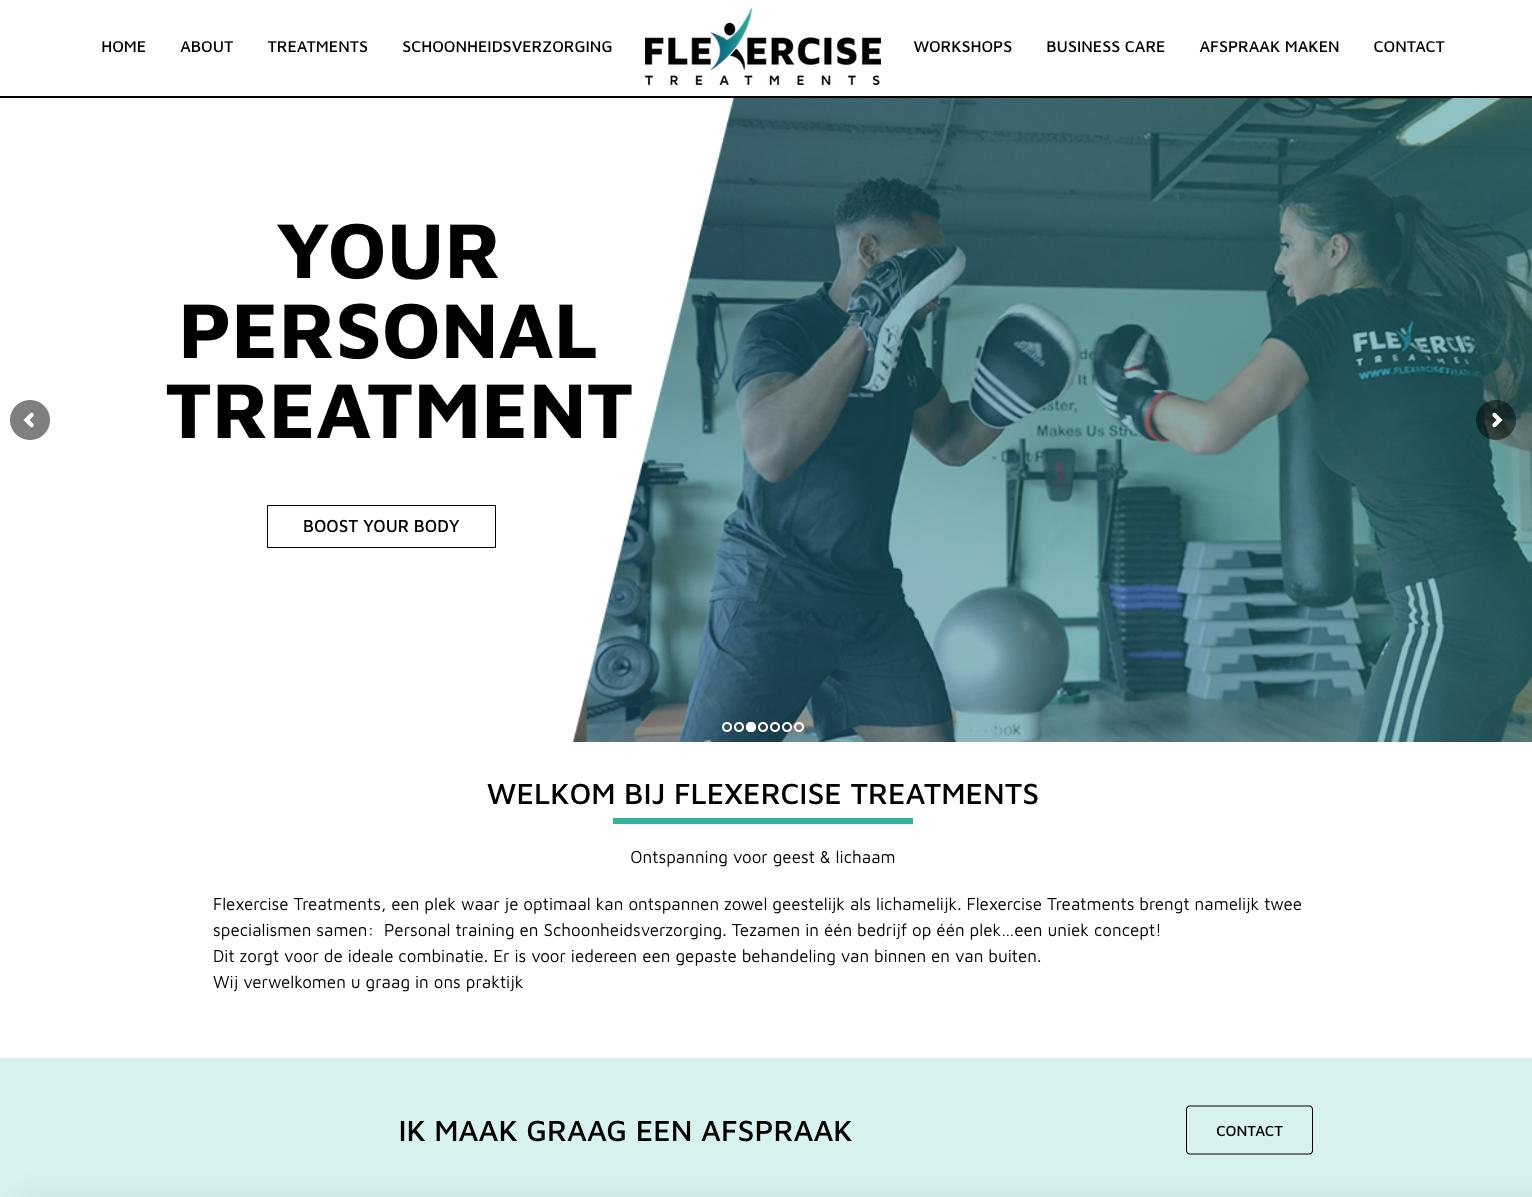 WebMagix-portfolio-Flexercise-Treatments